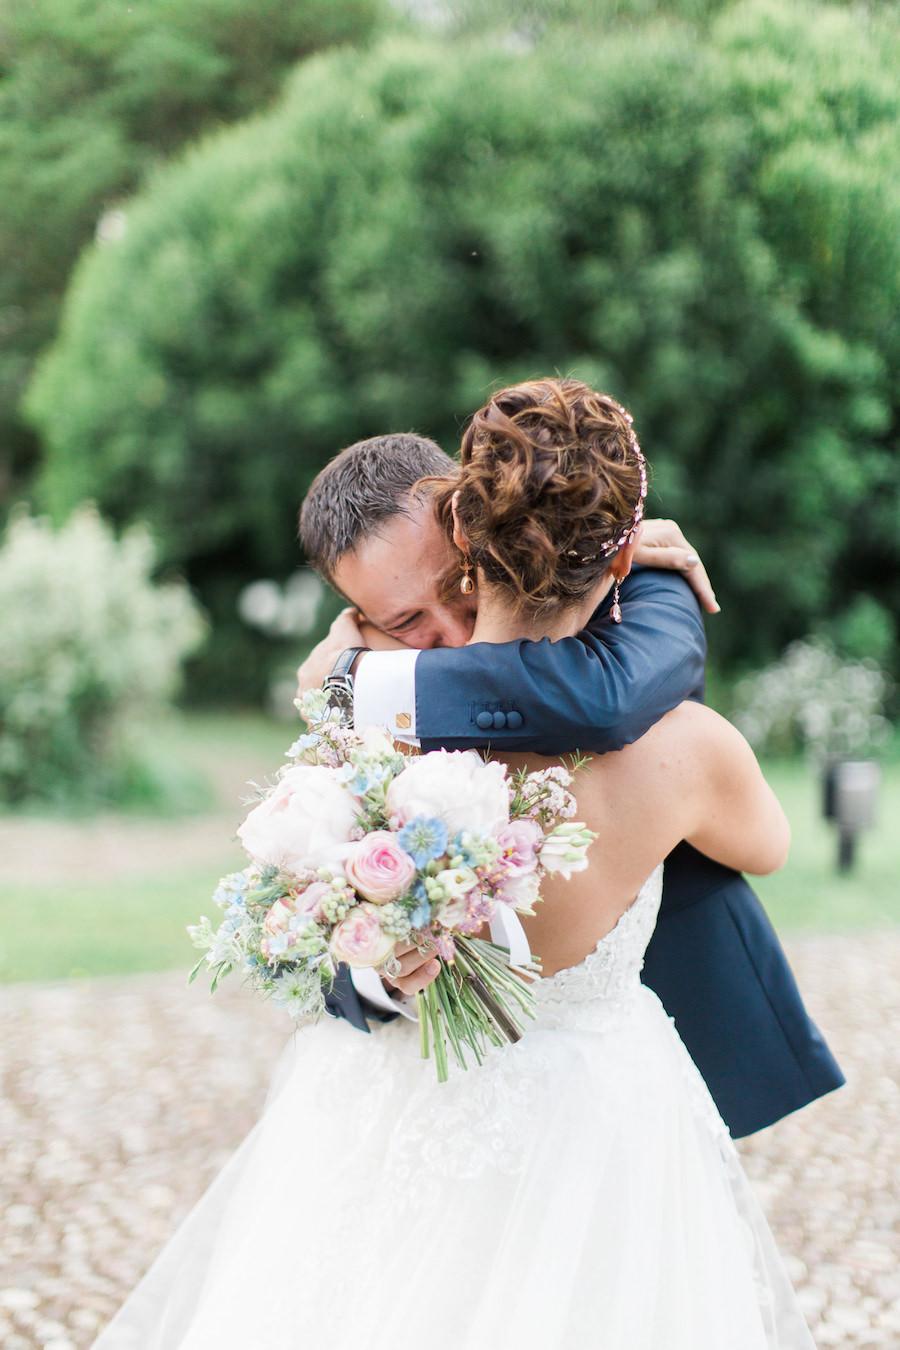 Matrimonio Rosa Quarzo E Azzurro Serenity : Un matrimonio boho chic e geometrico wedding wonderland